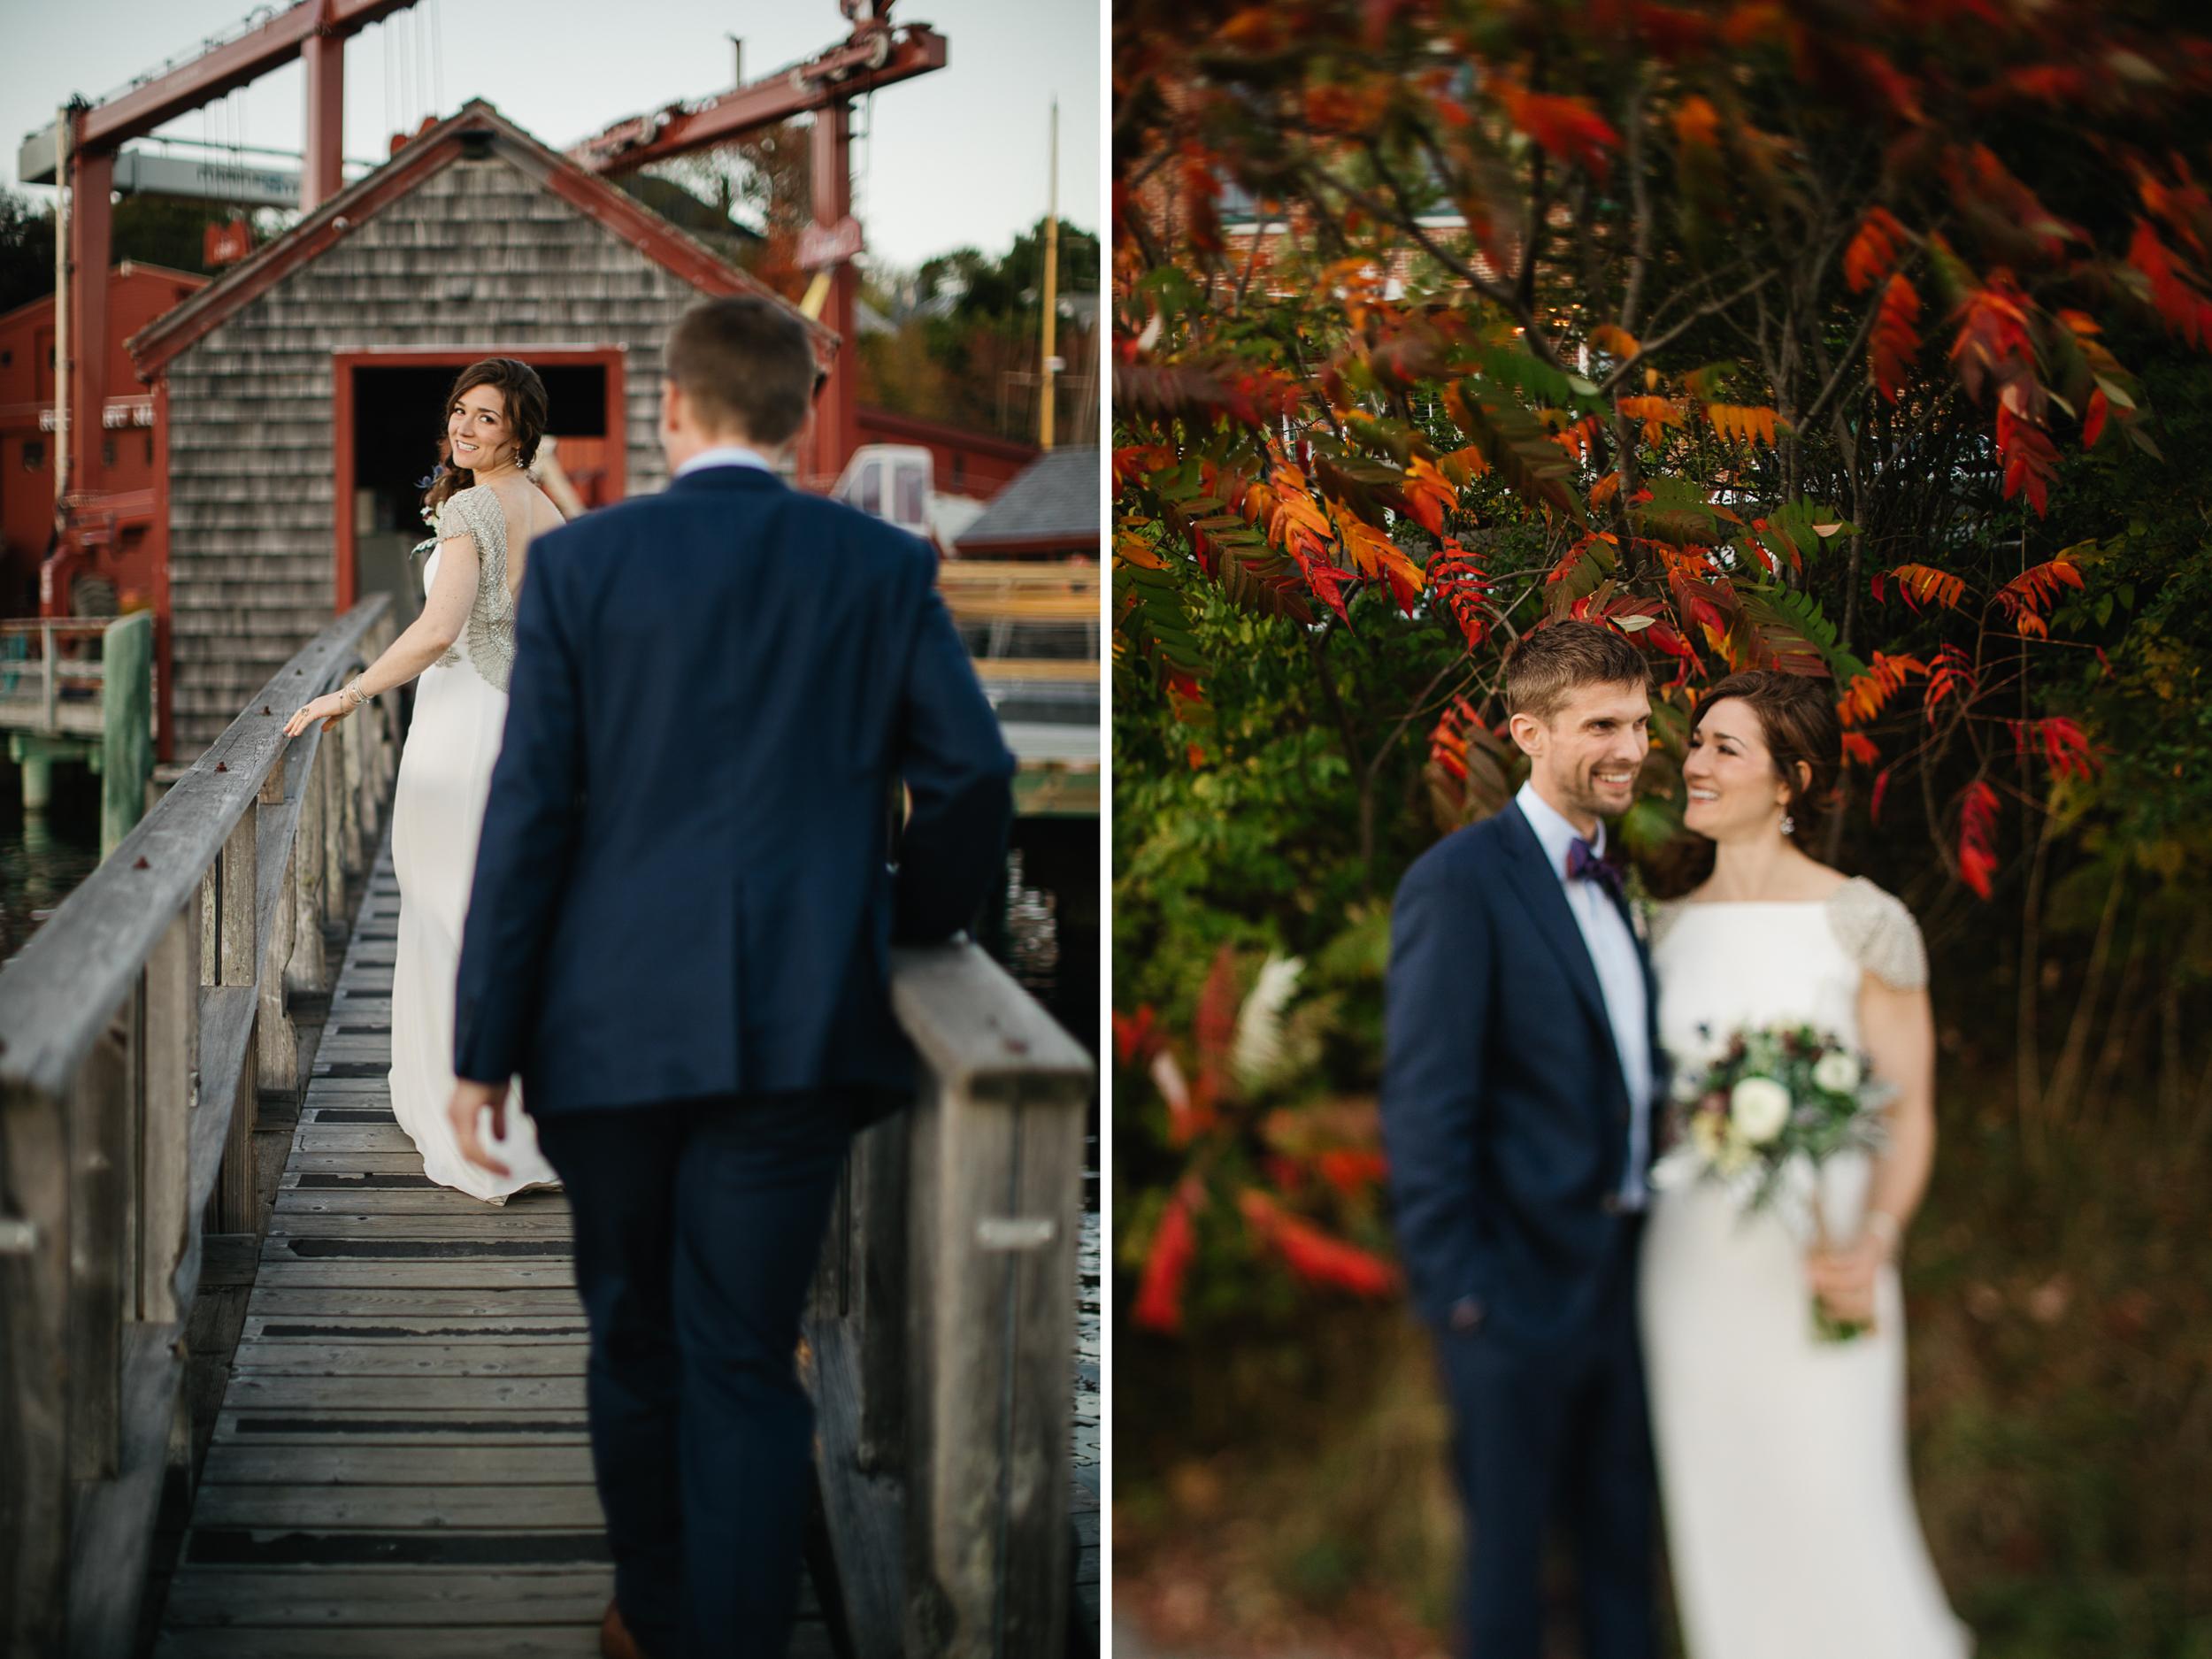 Mackenzie_Collins_Maine_wedding_in_Rockport_Union_hall_Nina_June_033.jpg